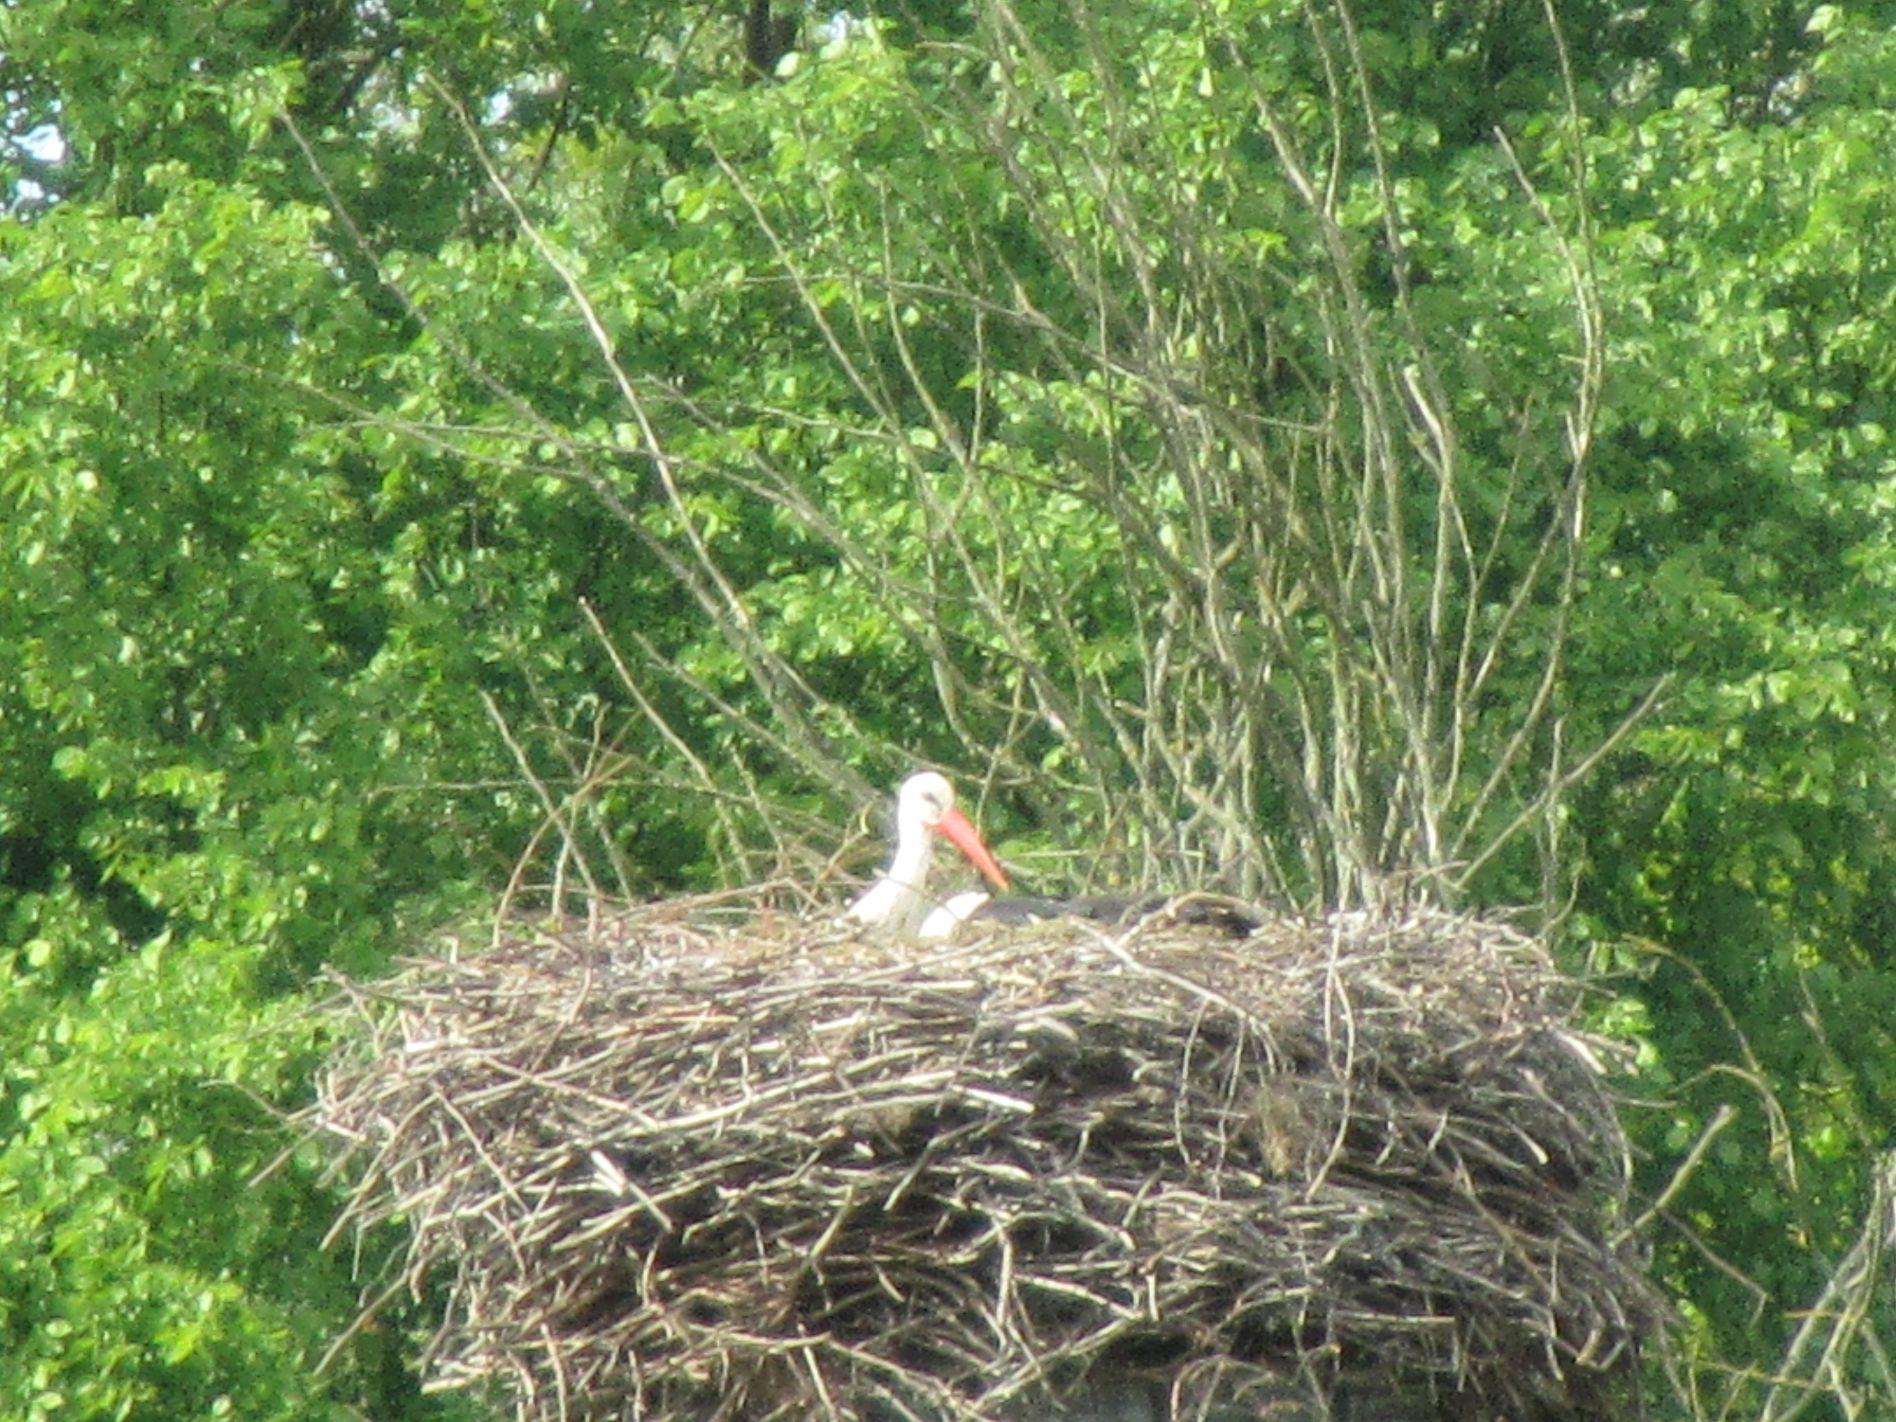 Storch in Kienitz